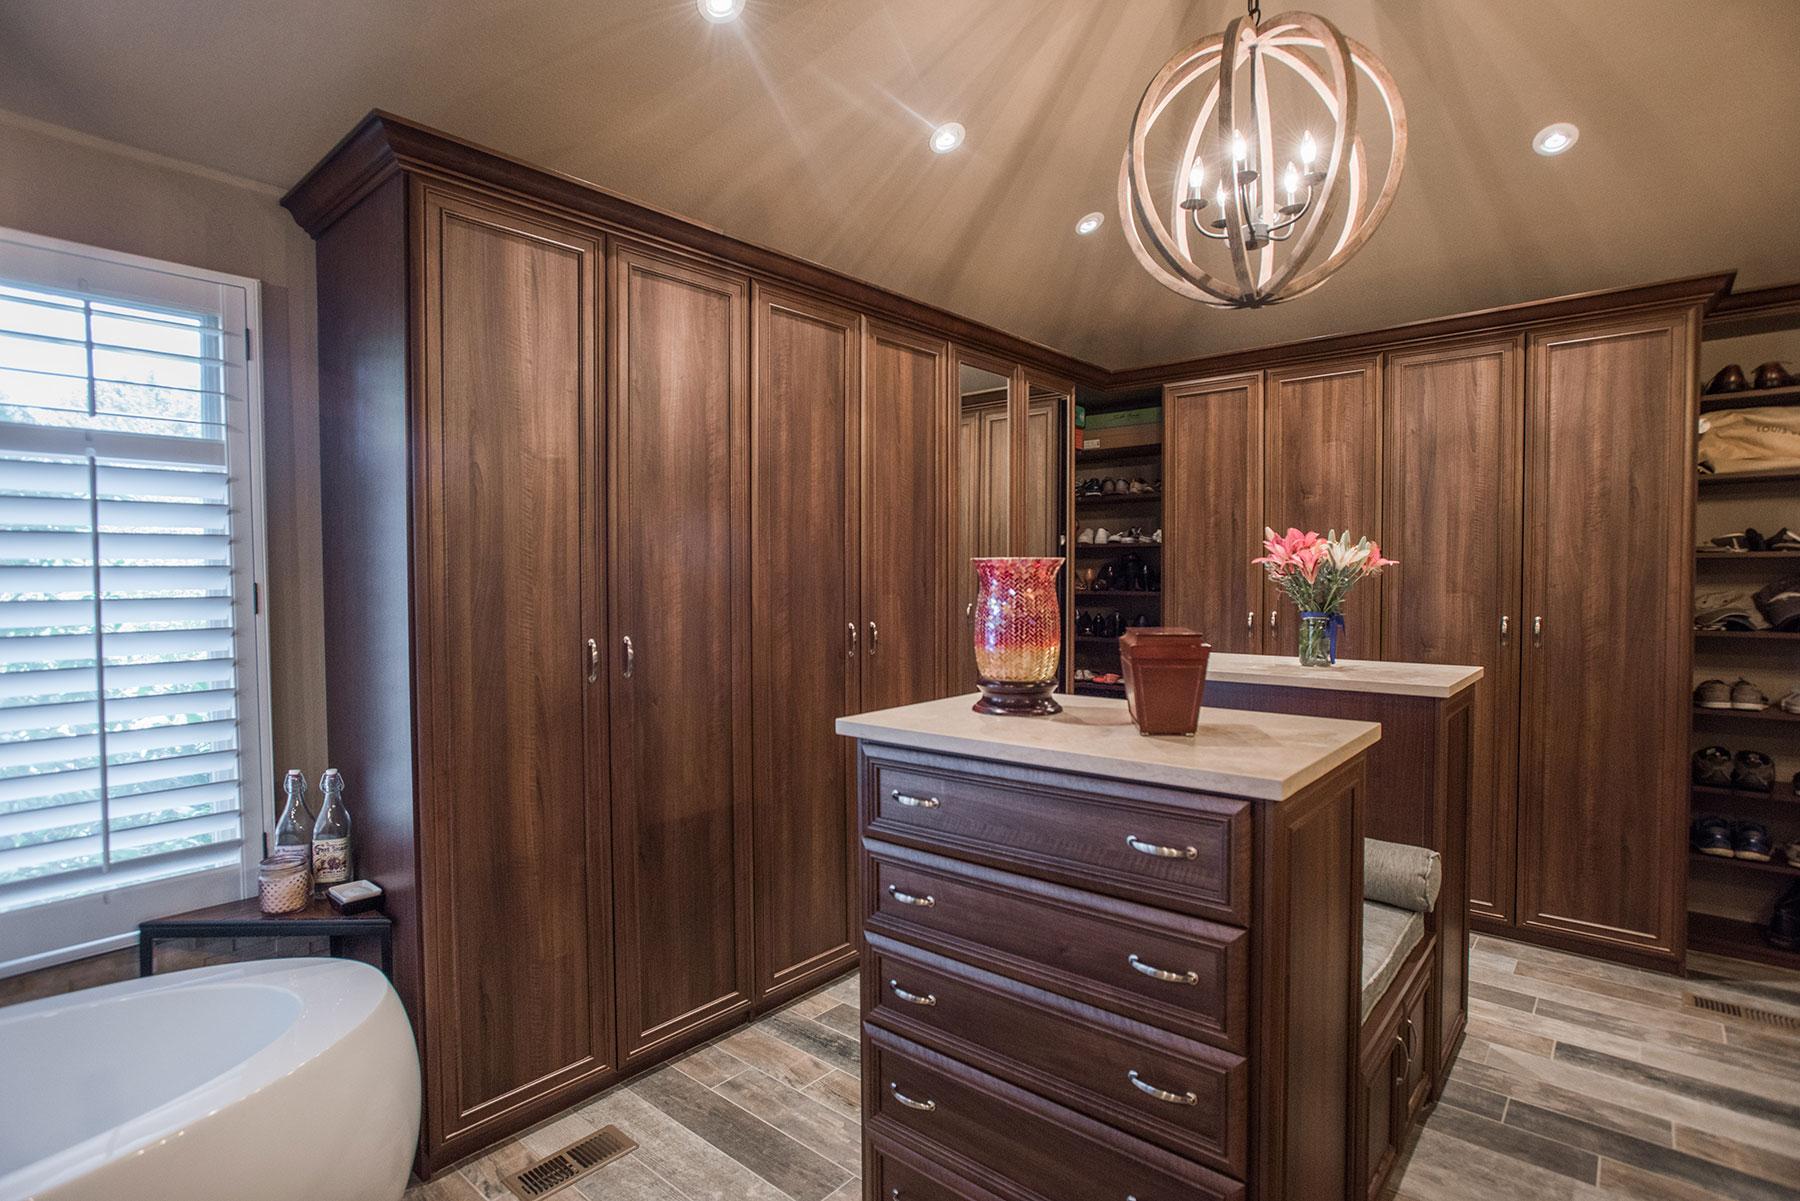 Wood Wardrobe Corner Units In Master Bath